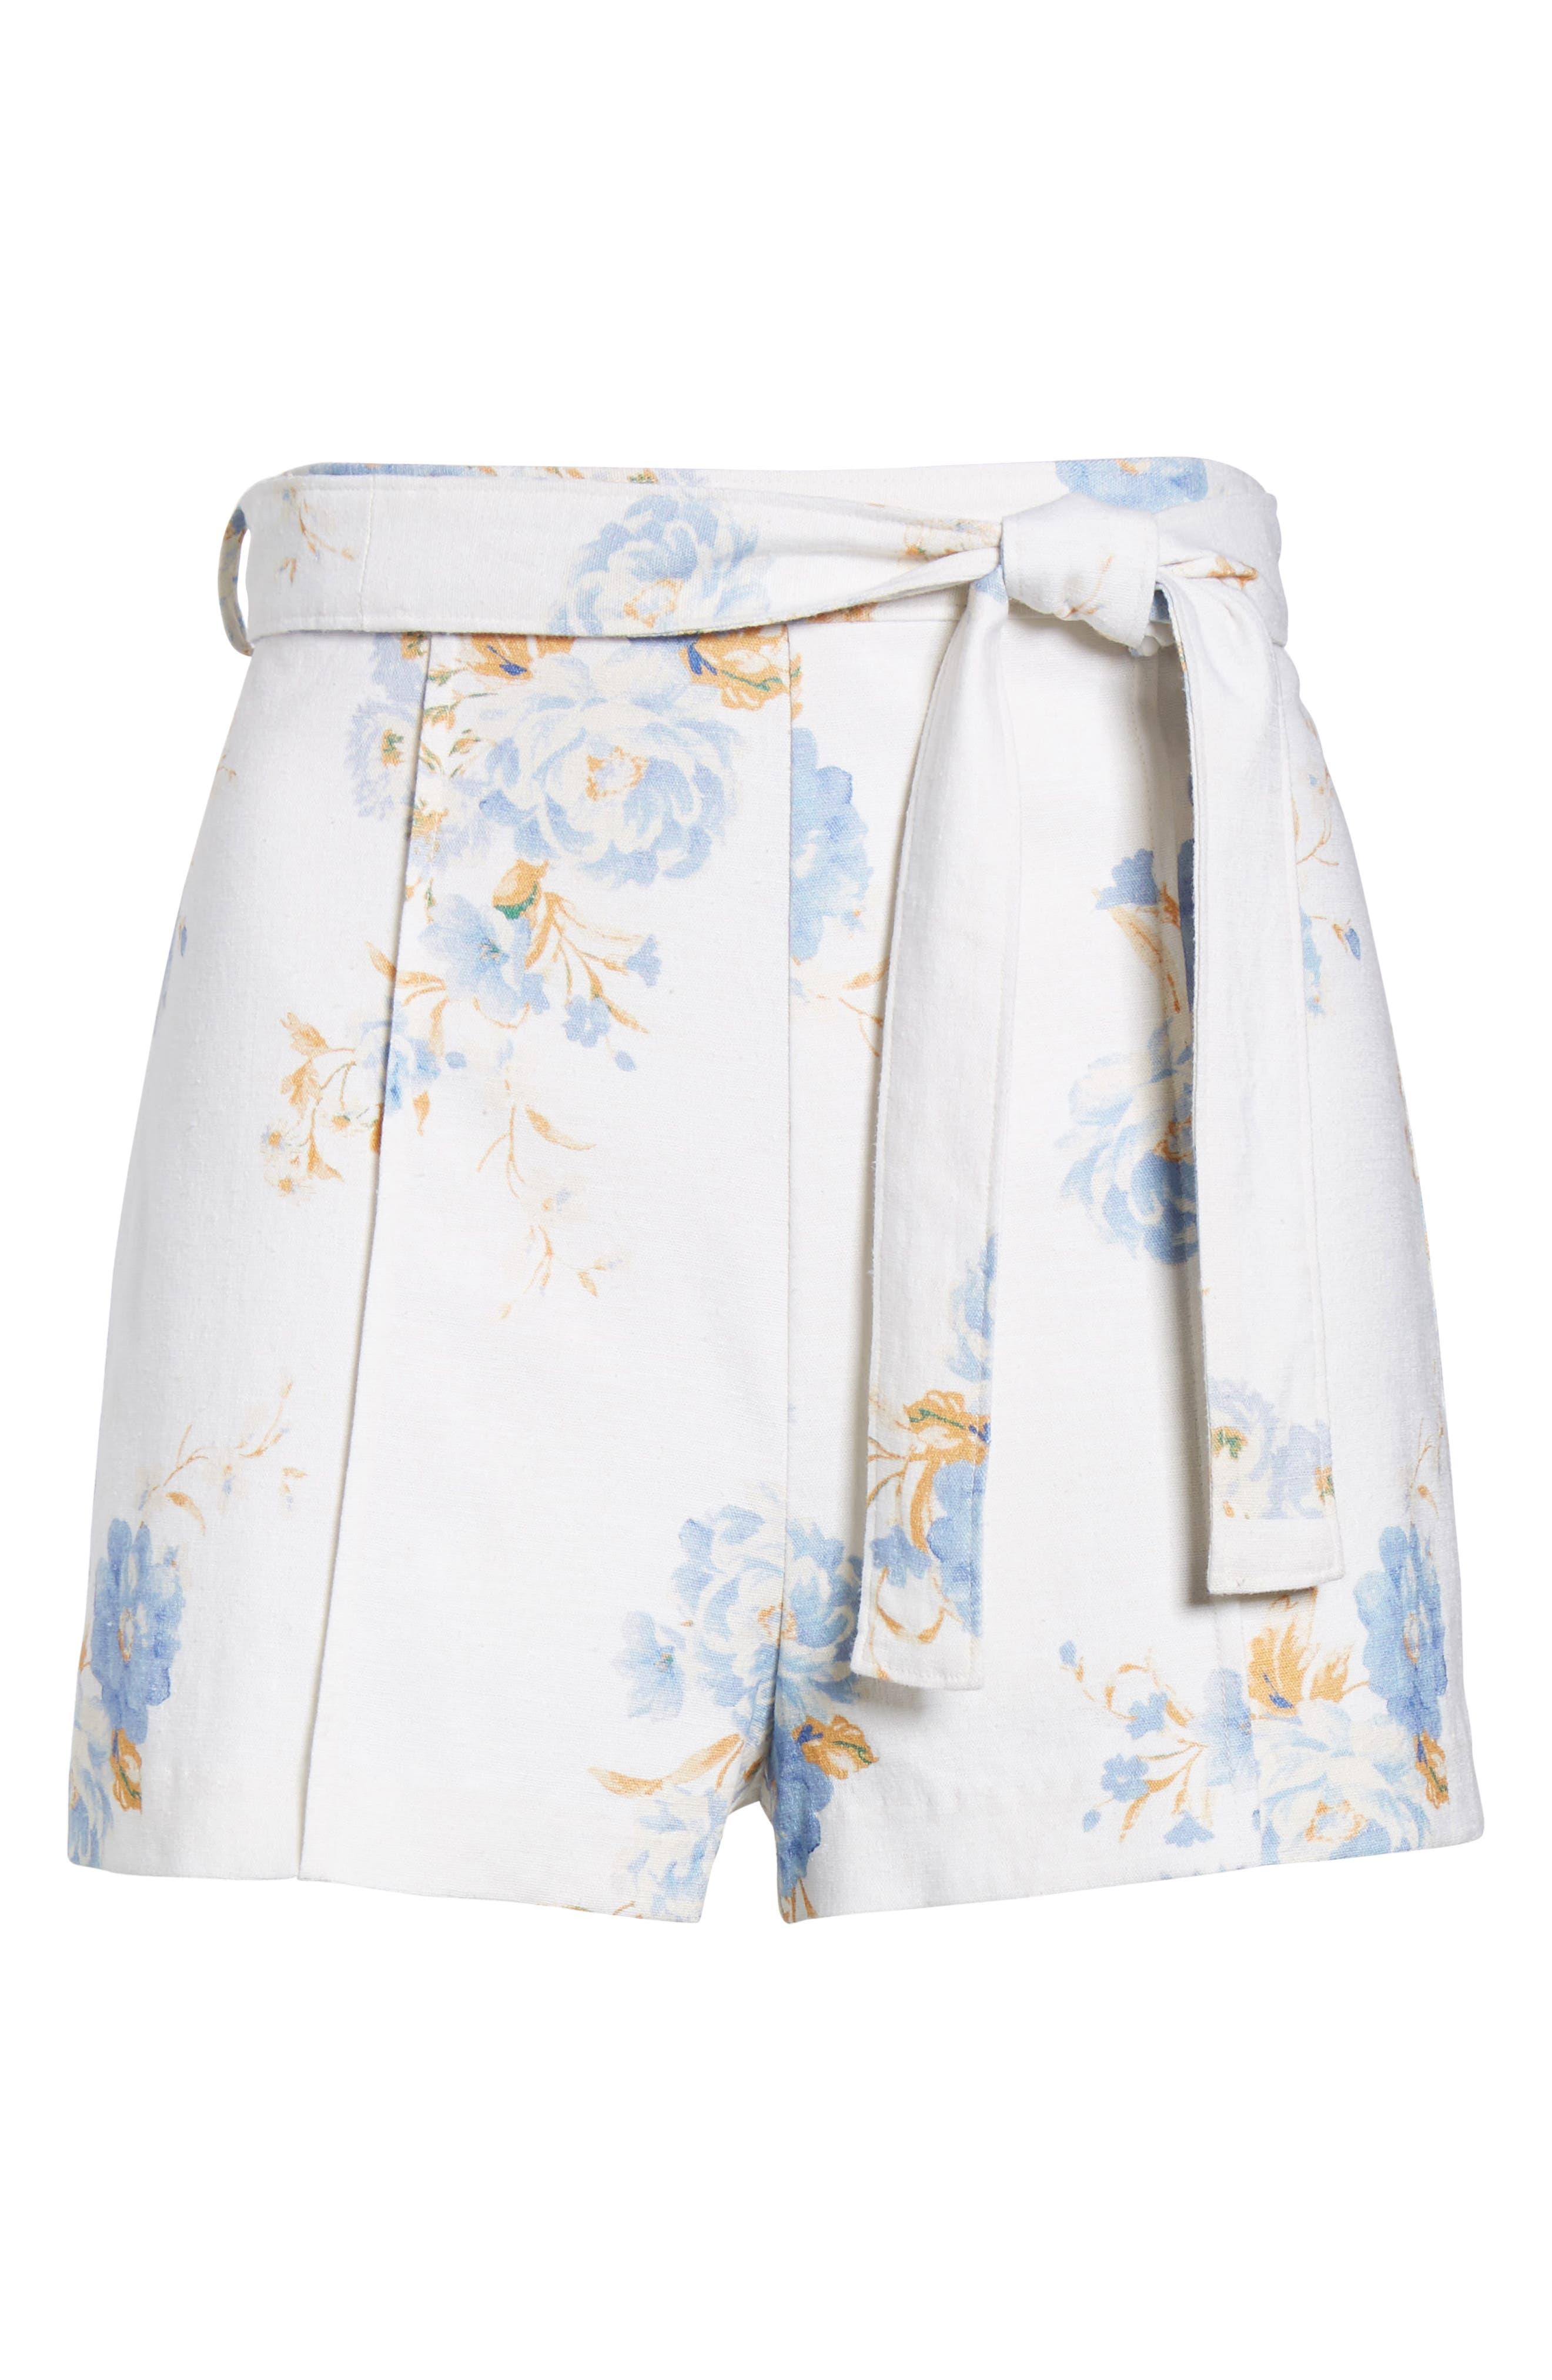 Matera High Waist Shorts,                             Alternate thumbnail 6, color,                             Ivory Floral